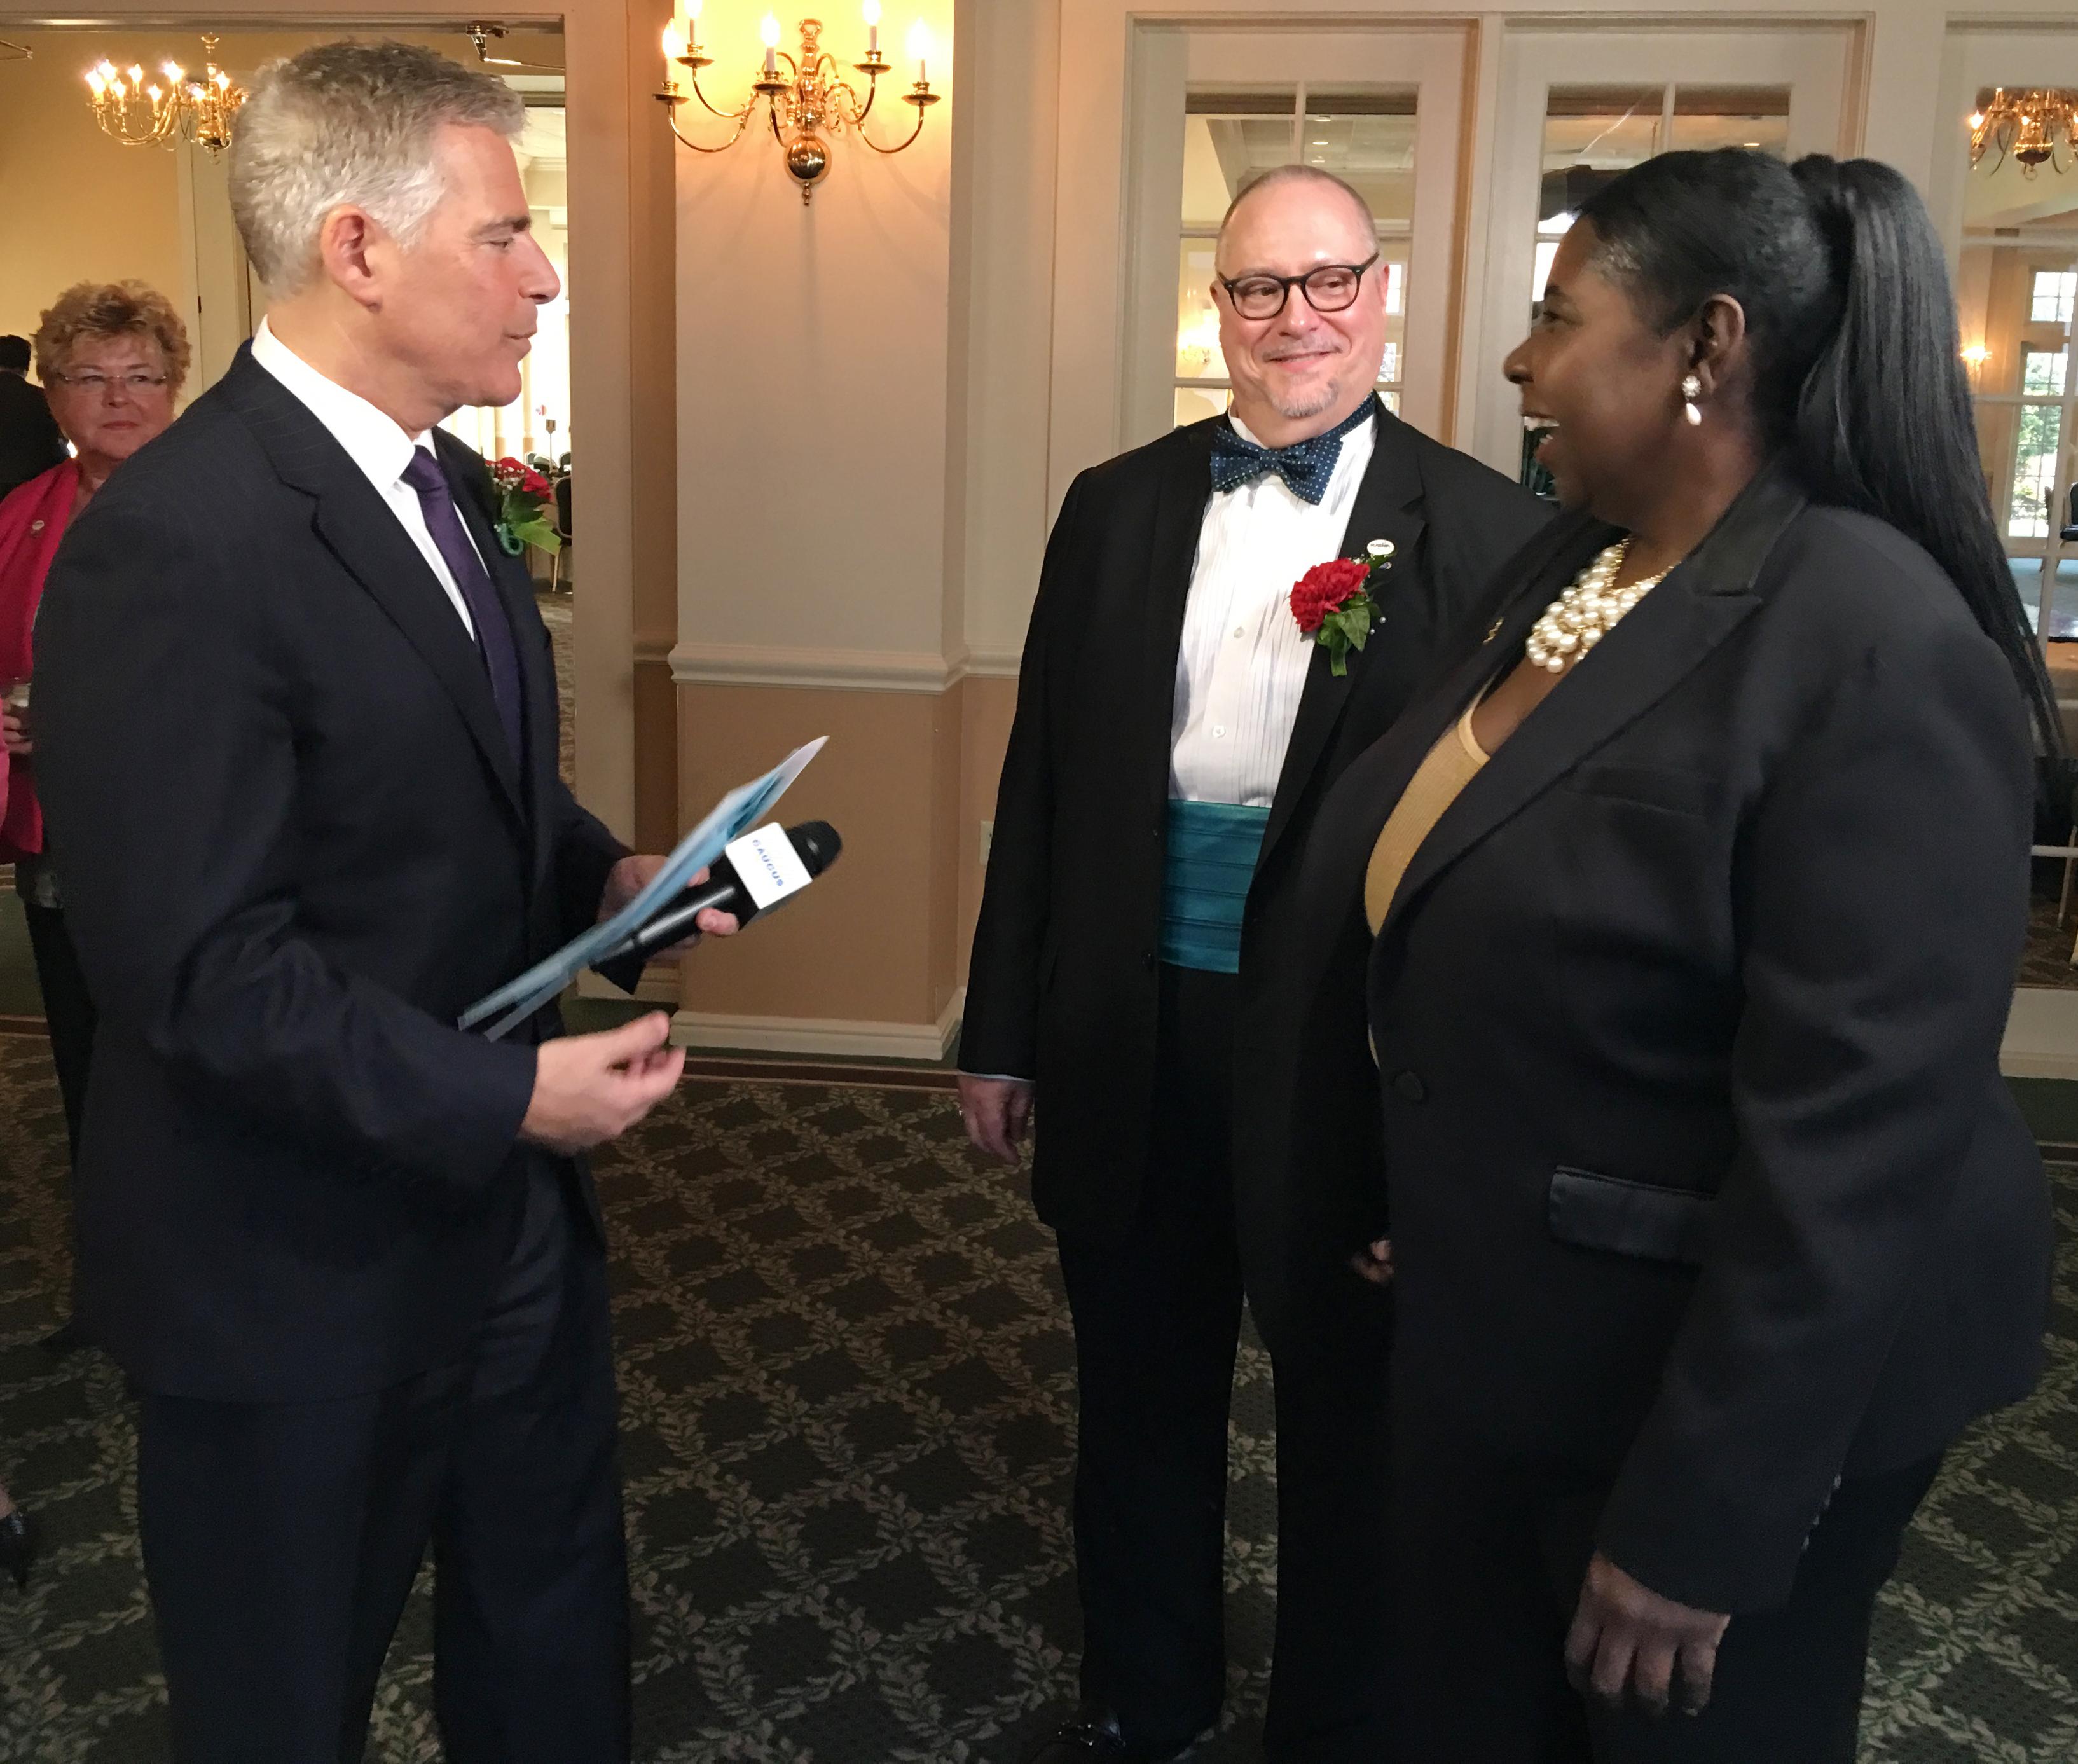 EPIC Award Honoree Steve Adubato Speaks With Benjamin Evans, DD, DNP, RN,